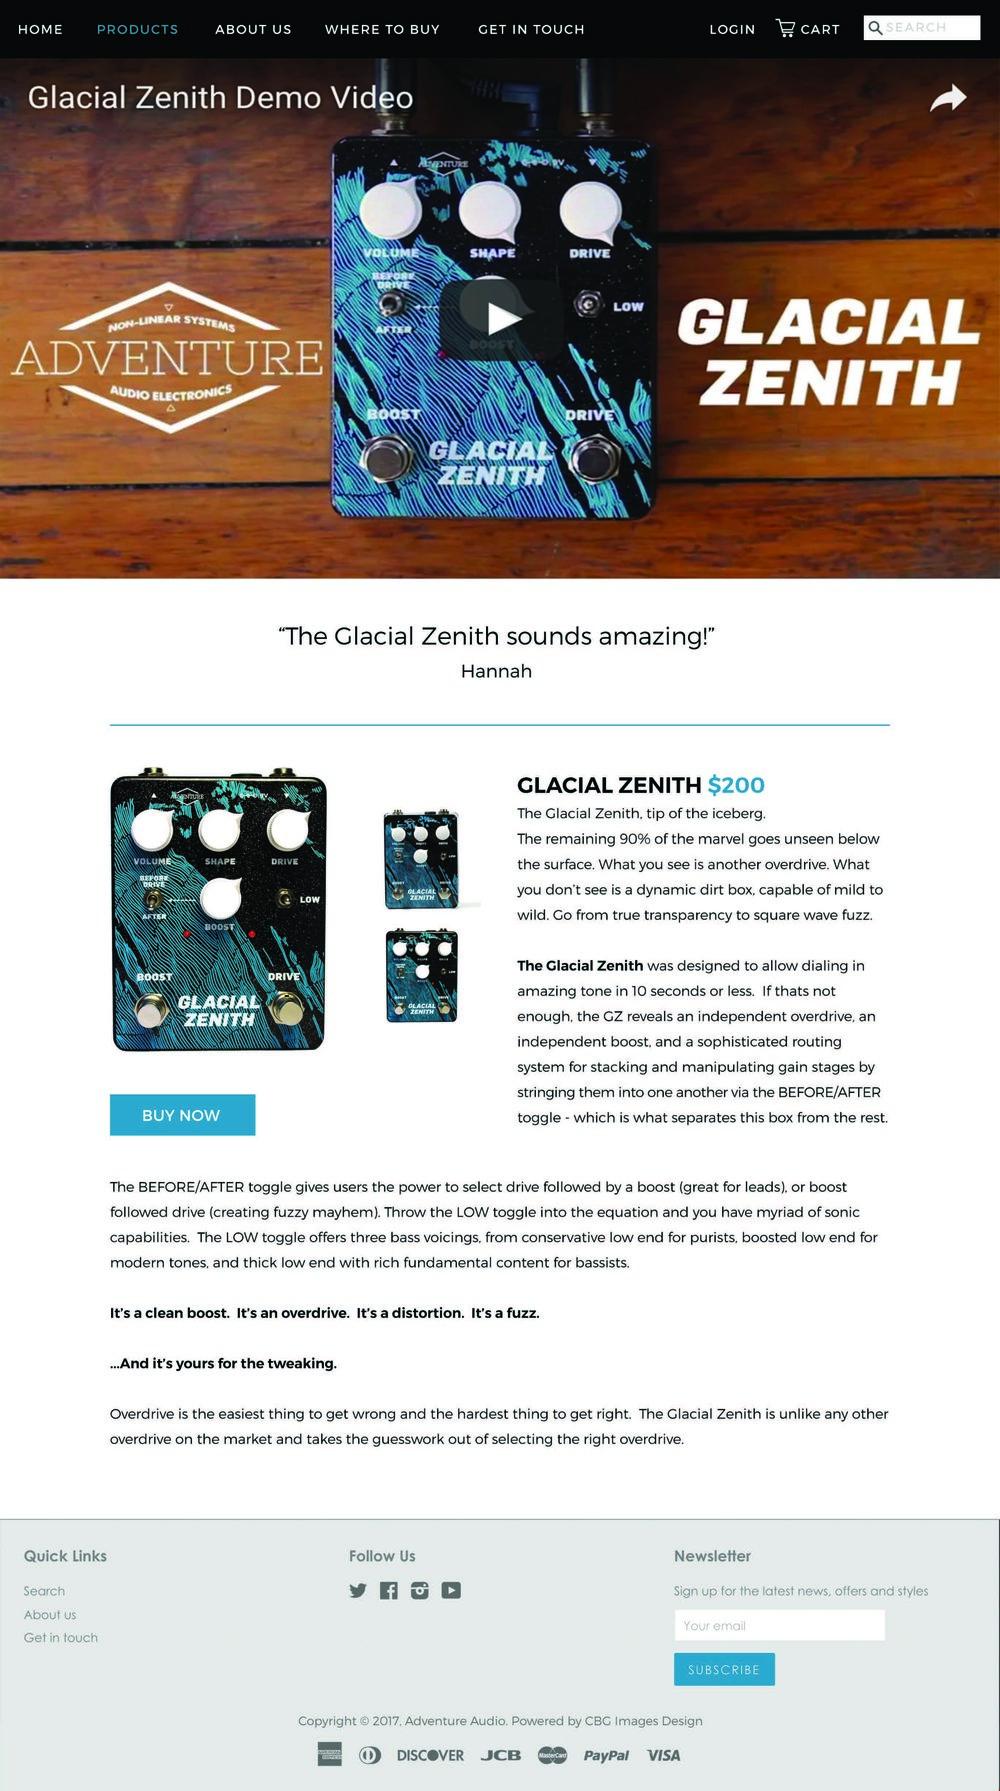 Adventure Audio_UIUX_Product Page_Glacial Zenith.jpg